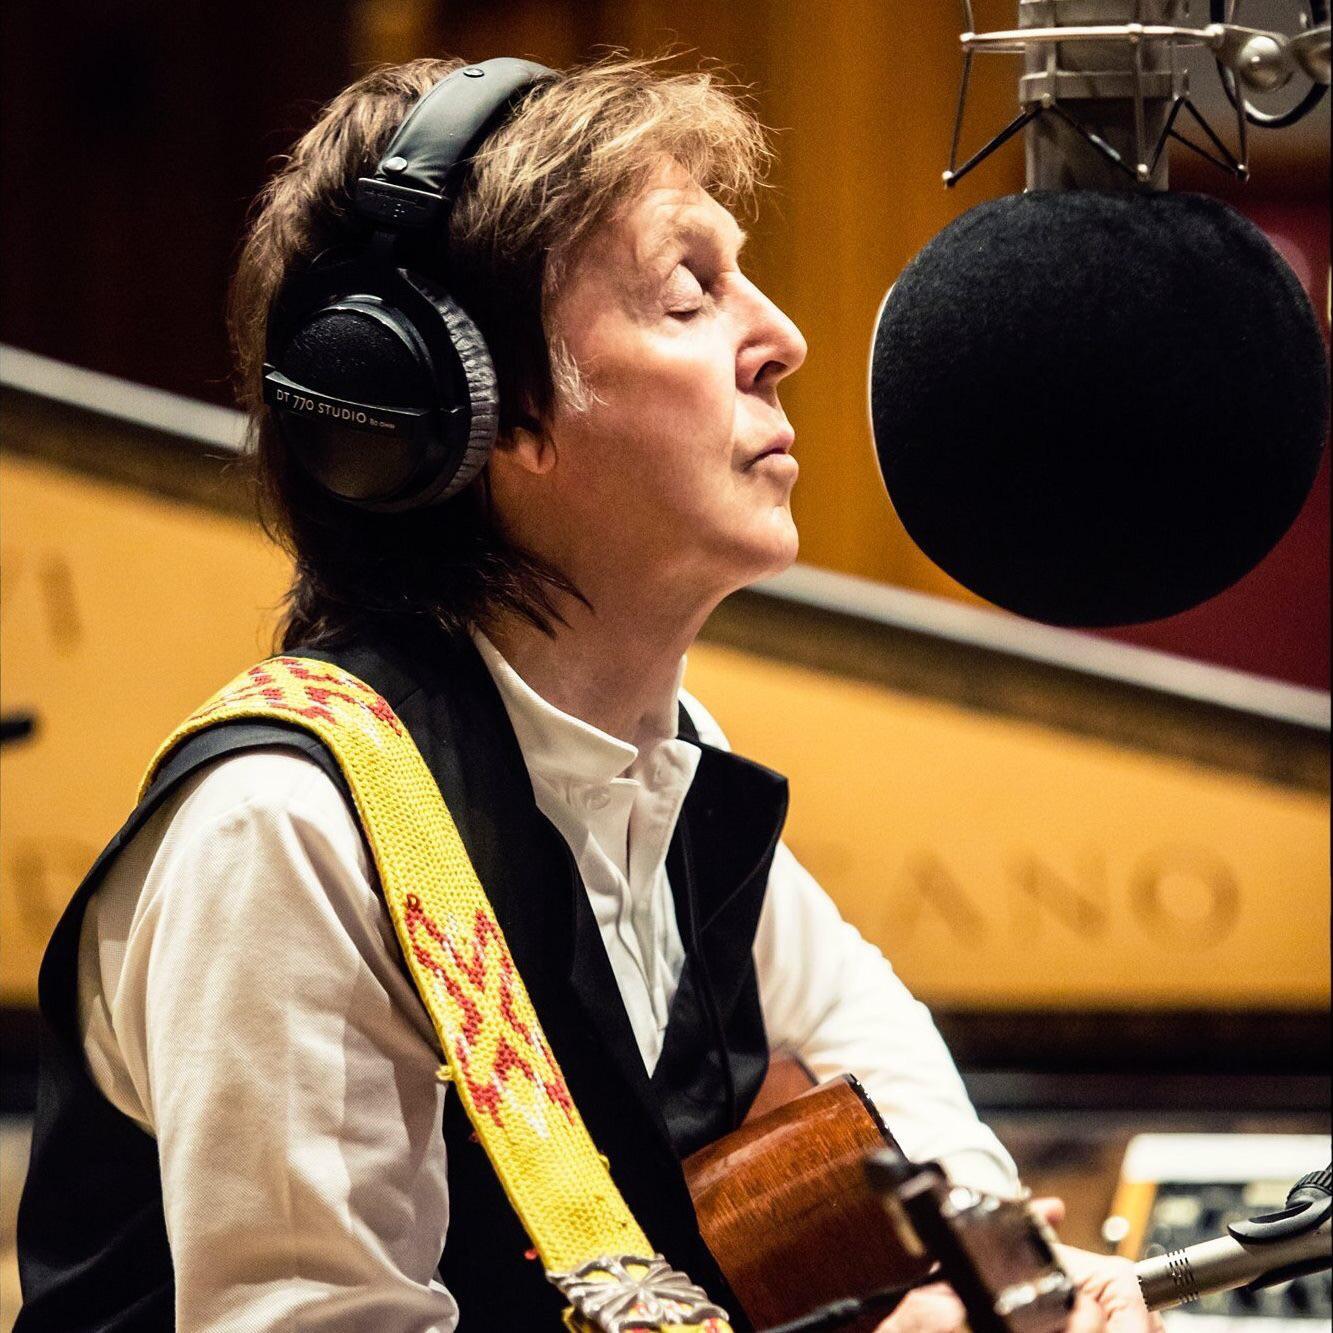 0.01 _@Paul Macartney Paul Mccartney 2021 - Writing of the McCartney III album during Isolattion